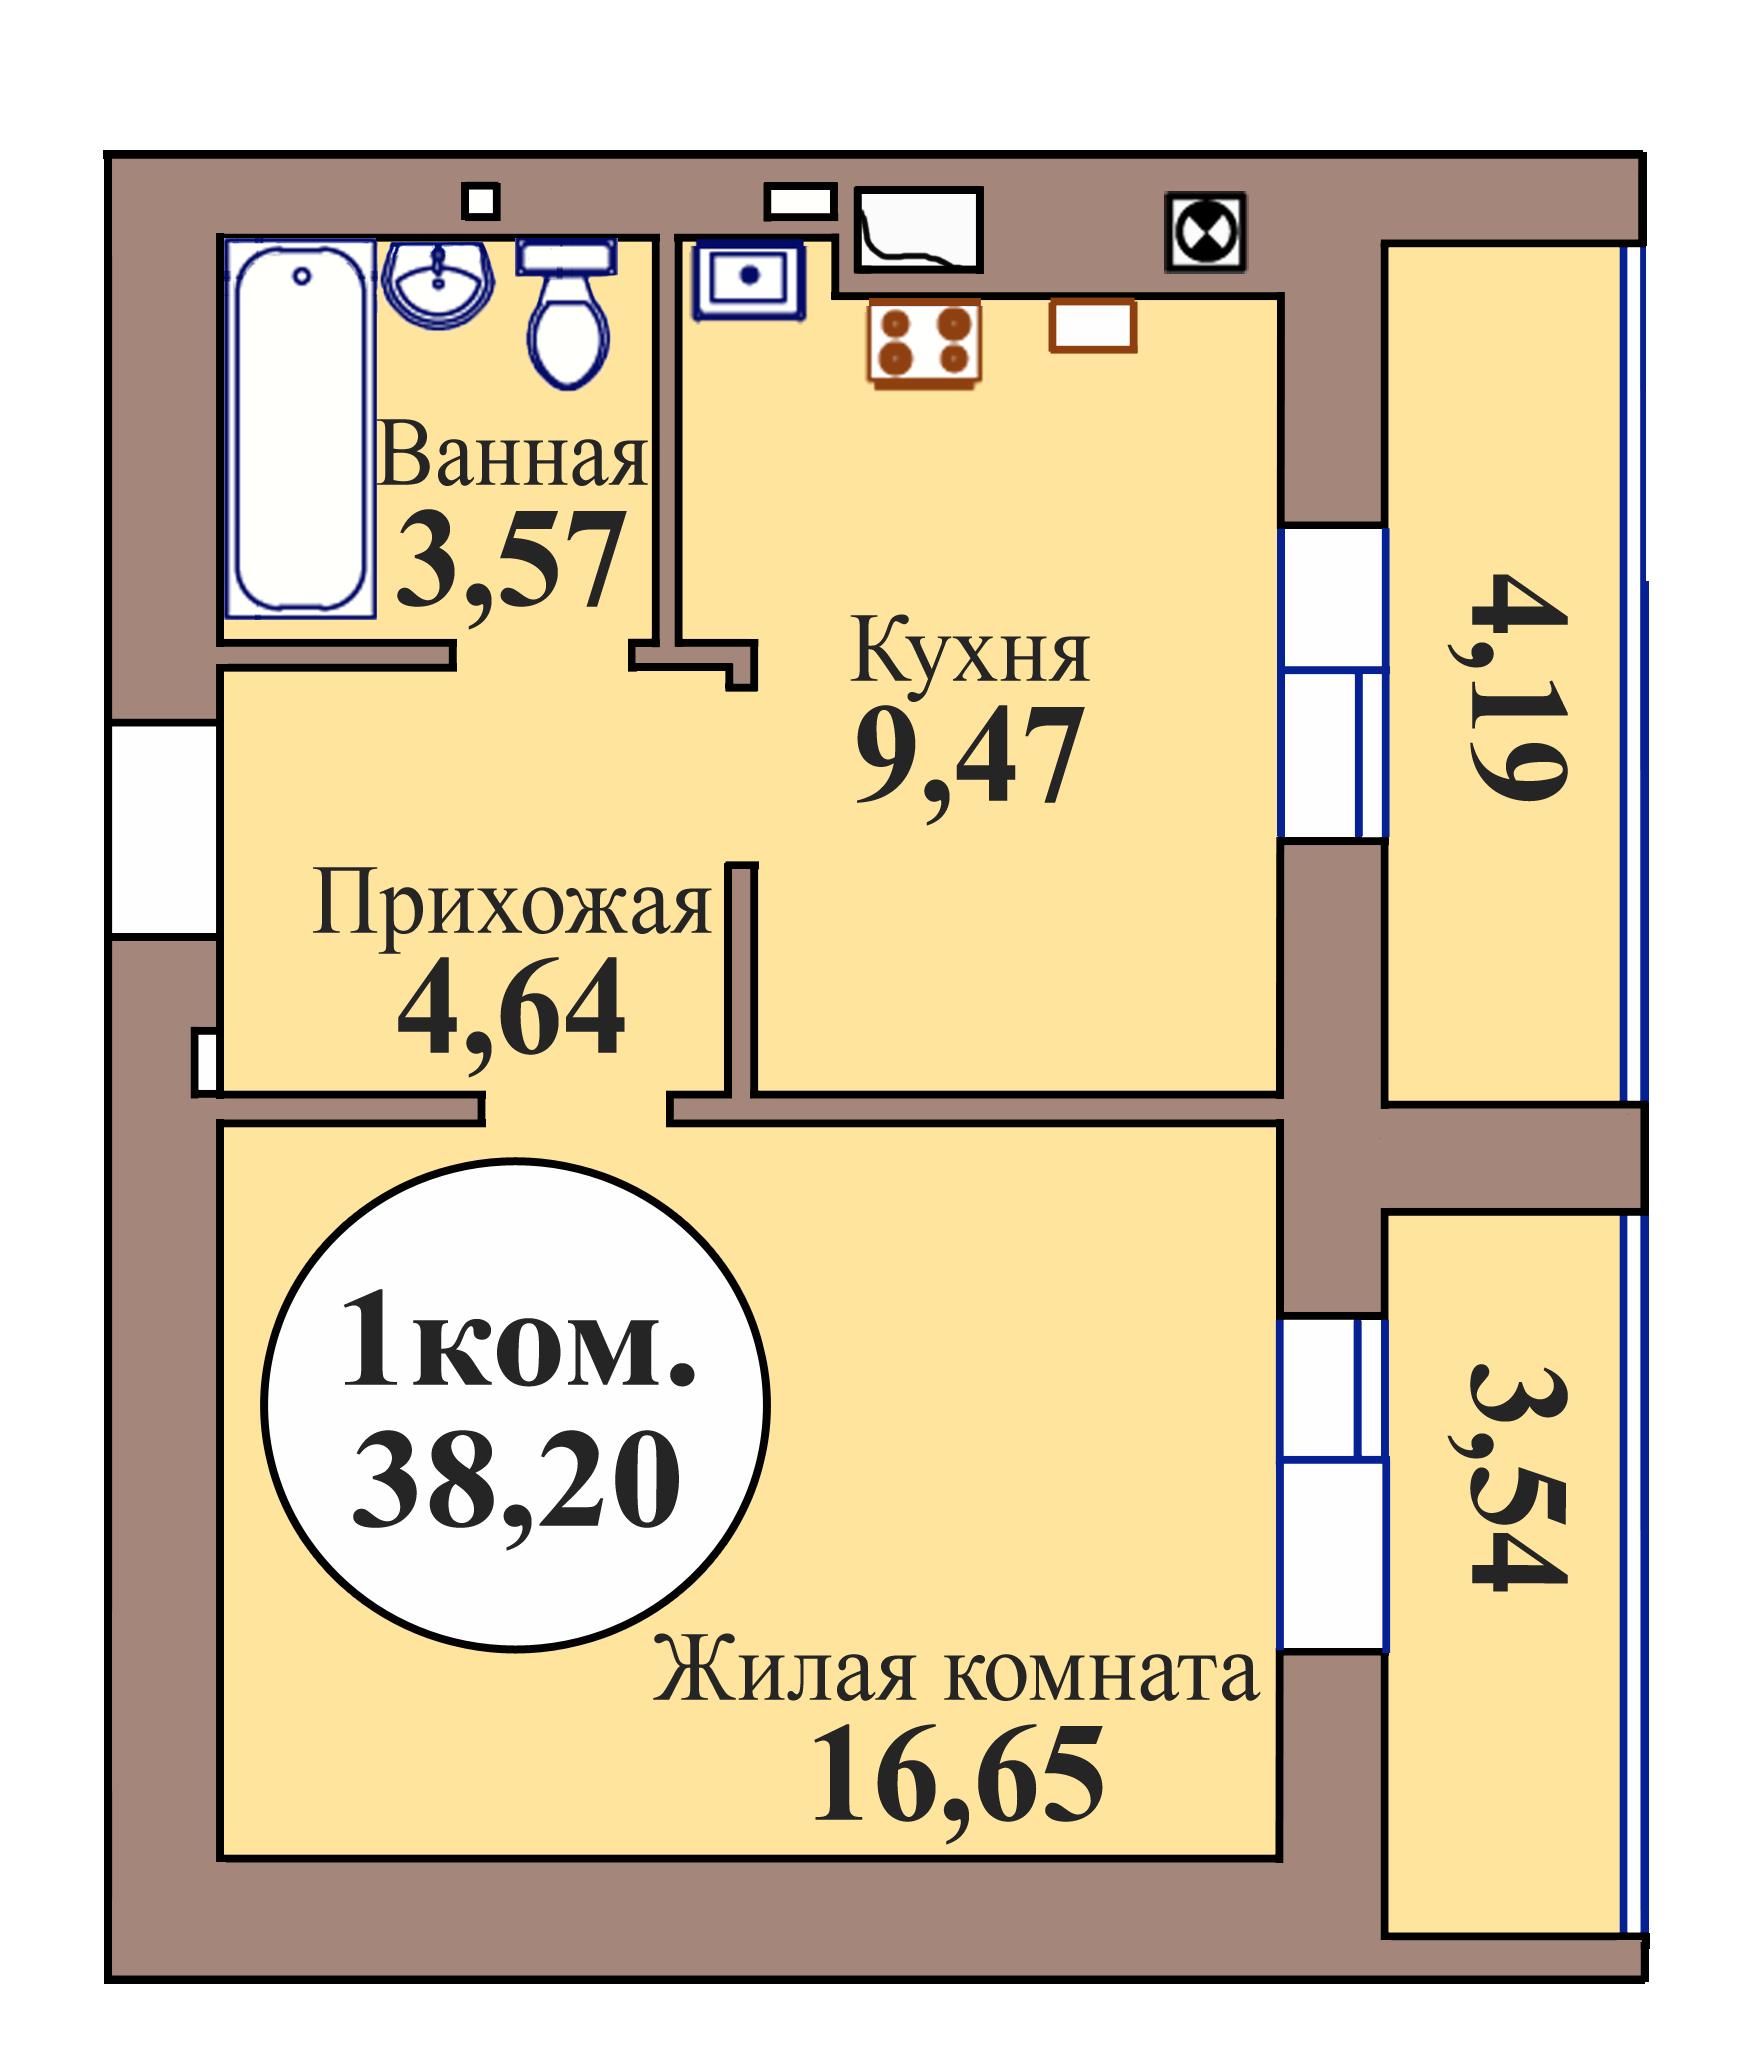 1-комн. кв. по пер. Калининградский, 5 кв. 1 в Калининграде